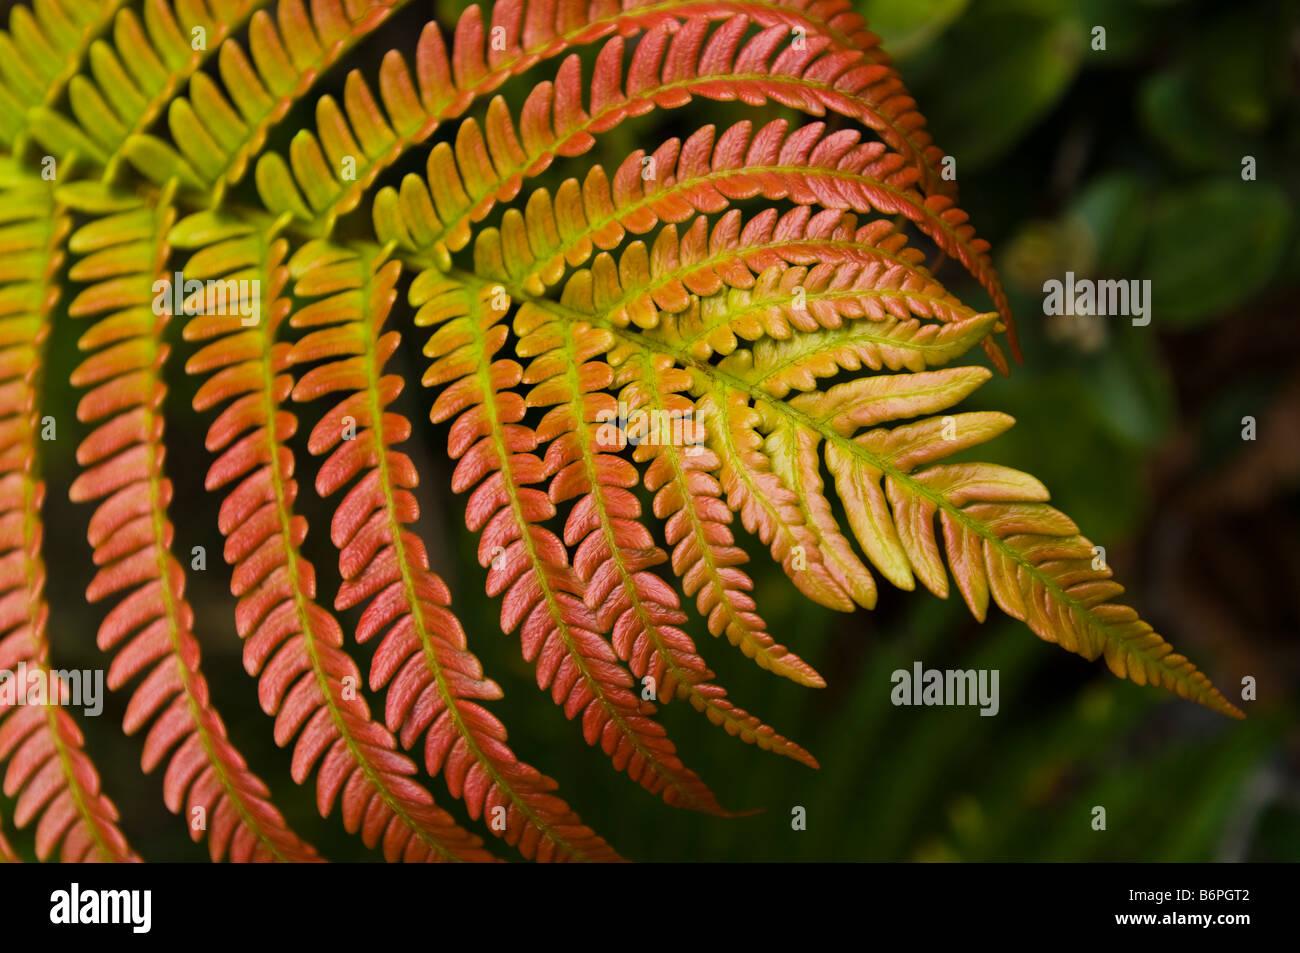 Colorful fern leaf in Volcano National Park, Big Island Hawaii. - Stock Image